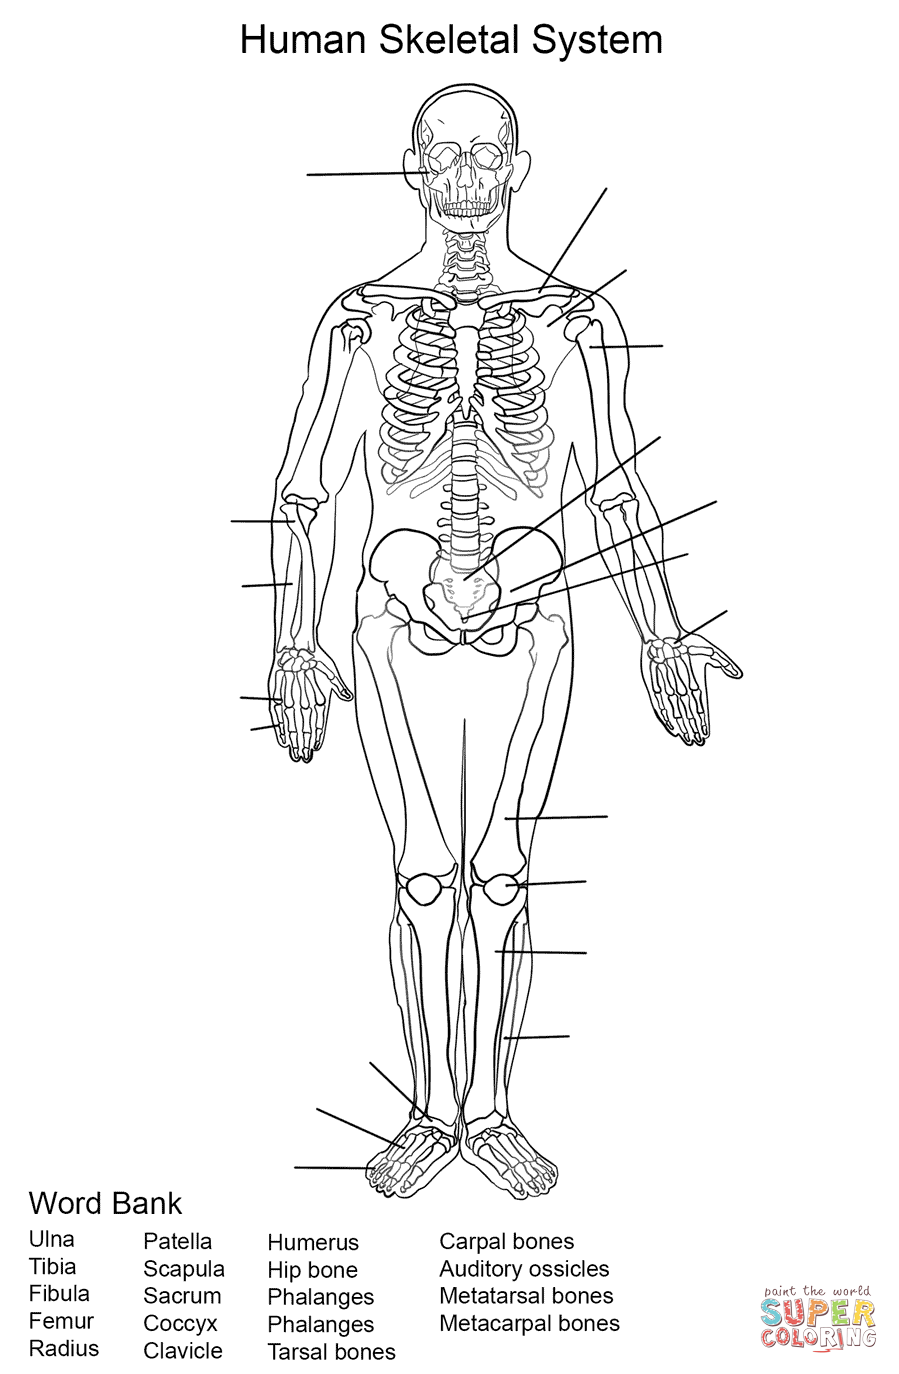 Human Skeletal System Worksheet Coloring Page   Free ...